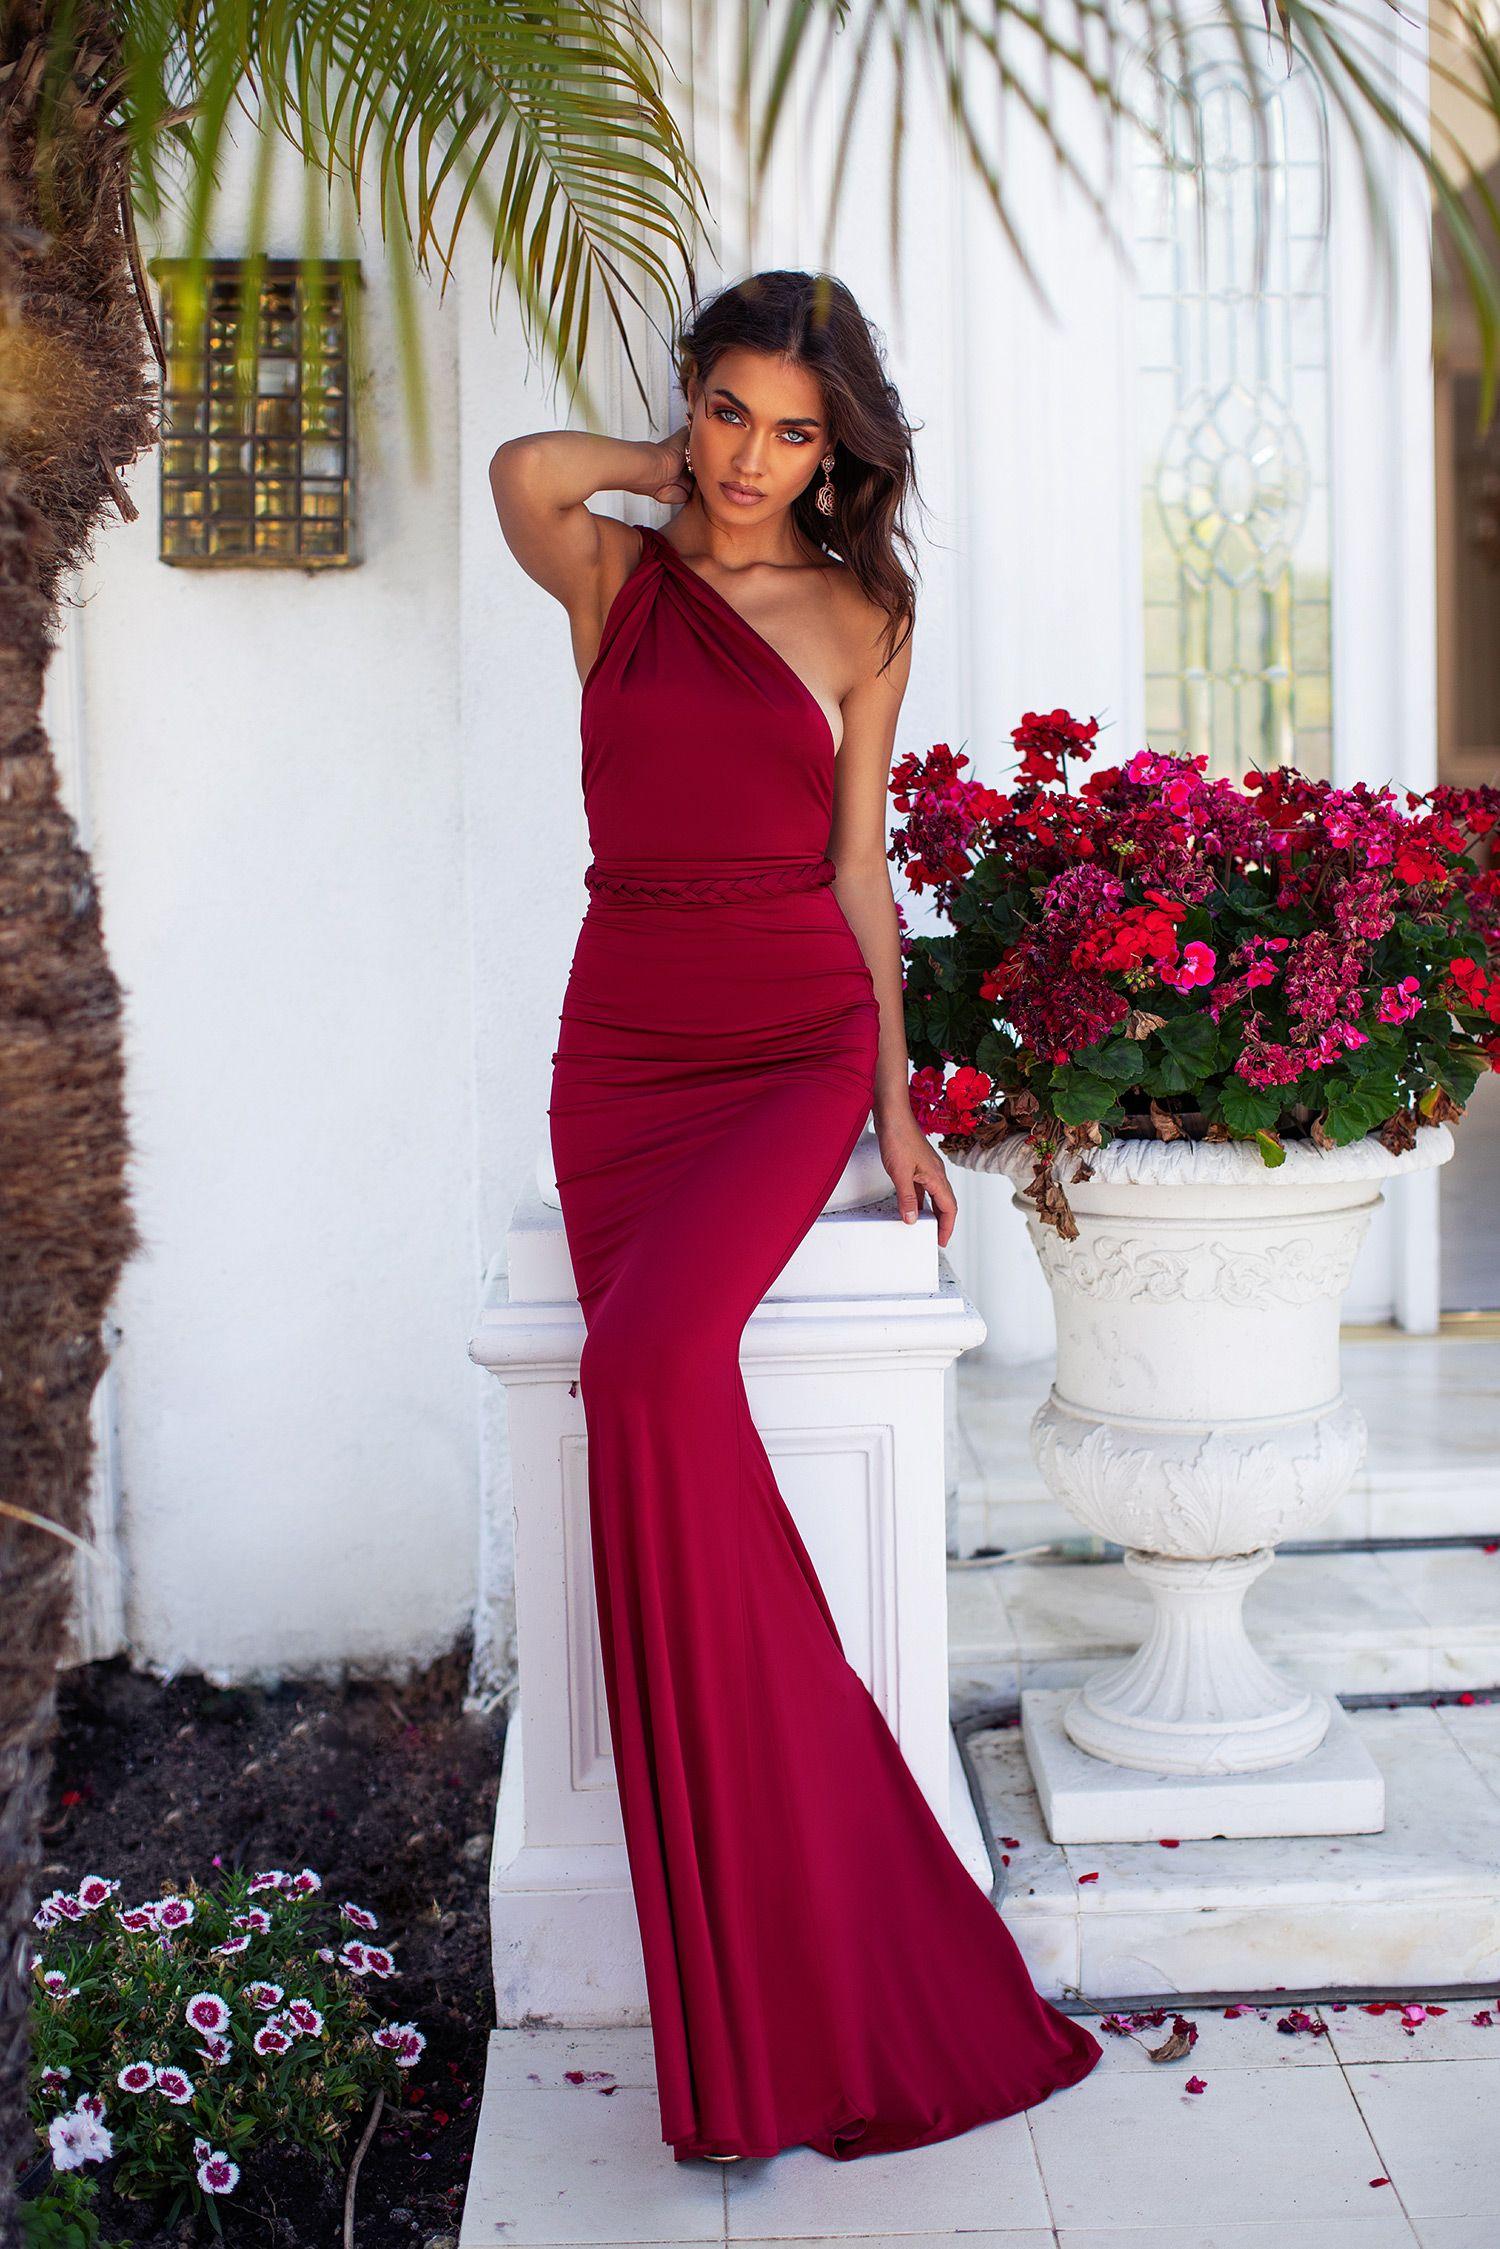 Graciela Wine Red Red Prom Dress Red Wedding Dresses Long Mermaid Dress [ 2249 x 1500 Pixel ]